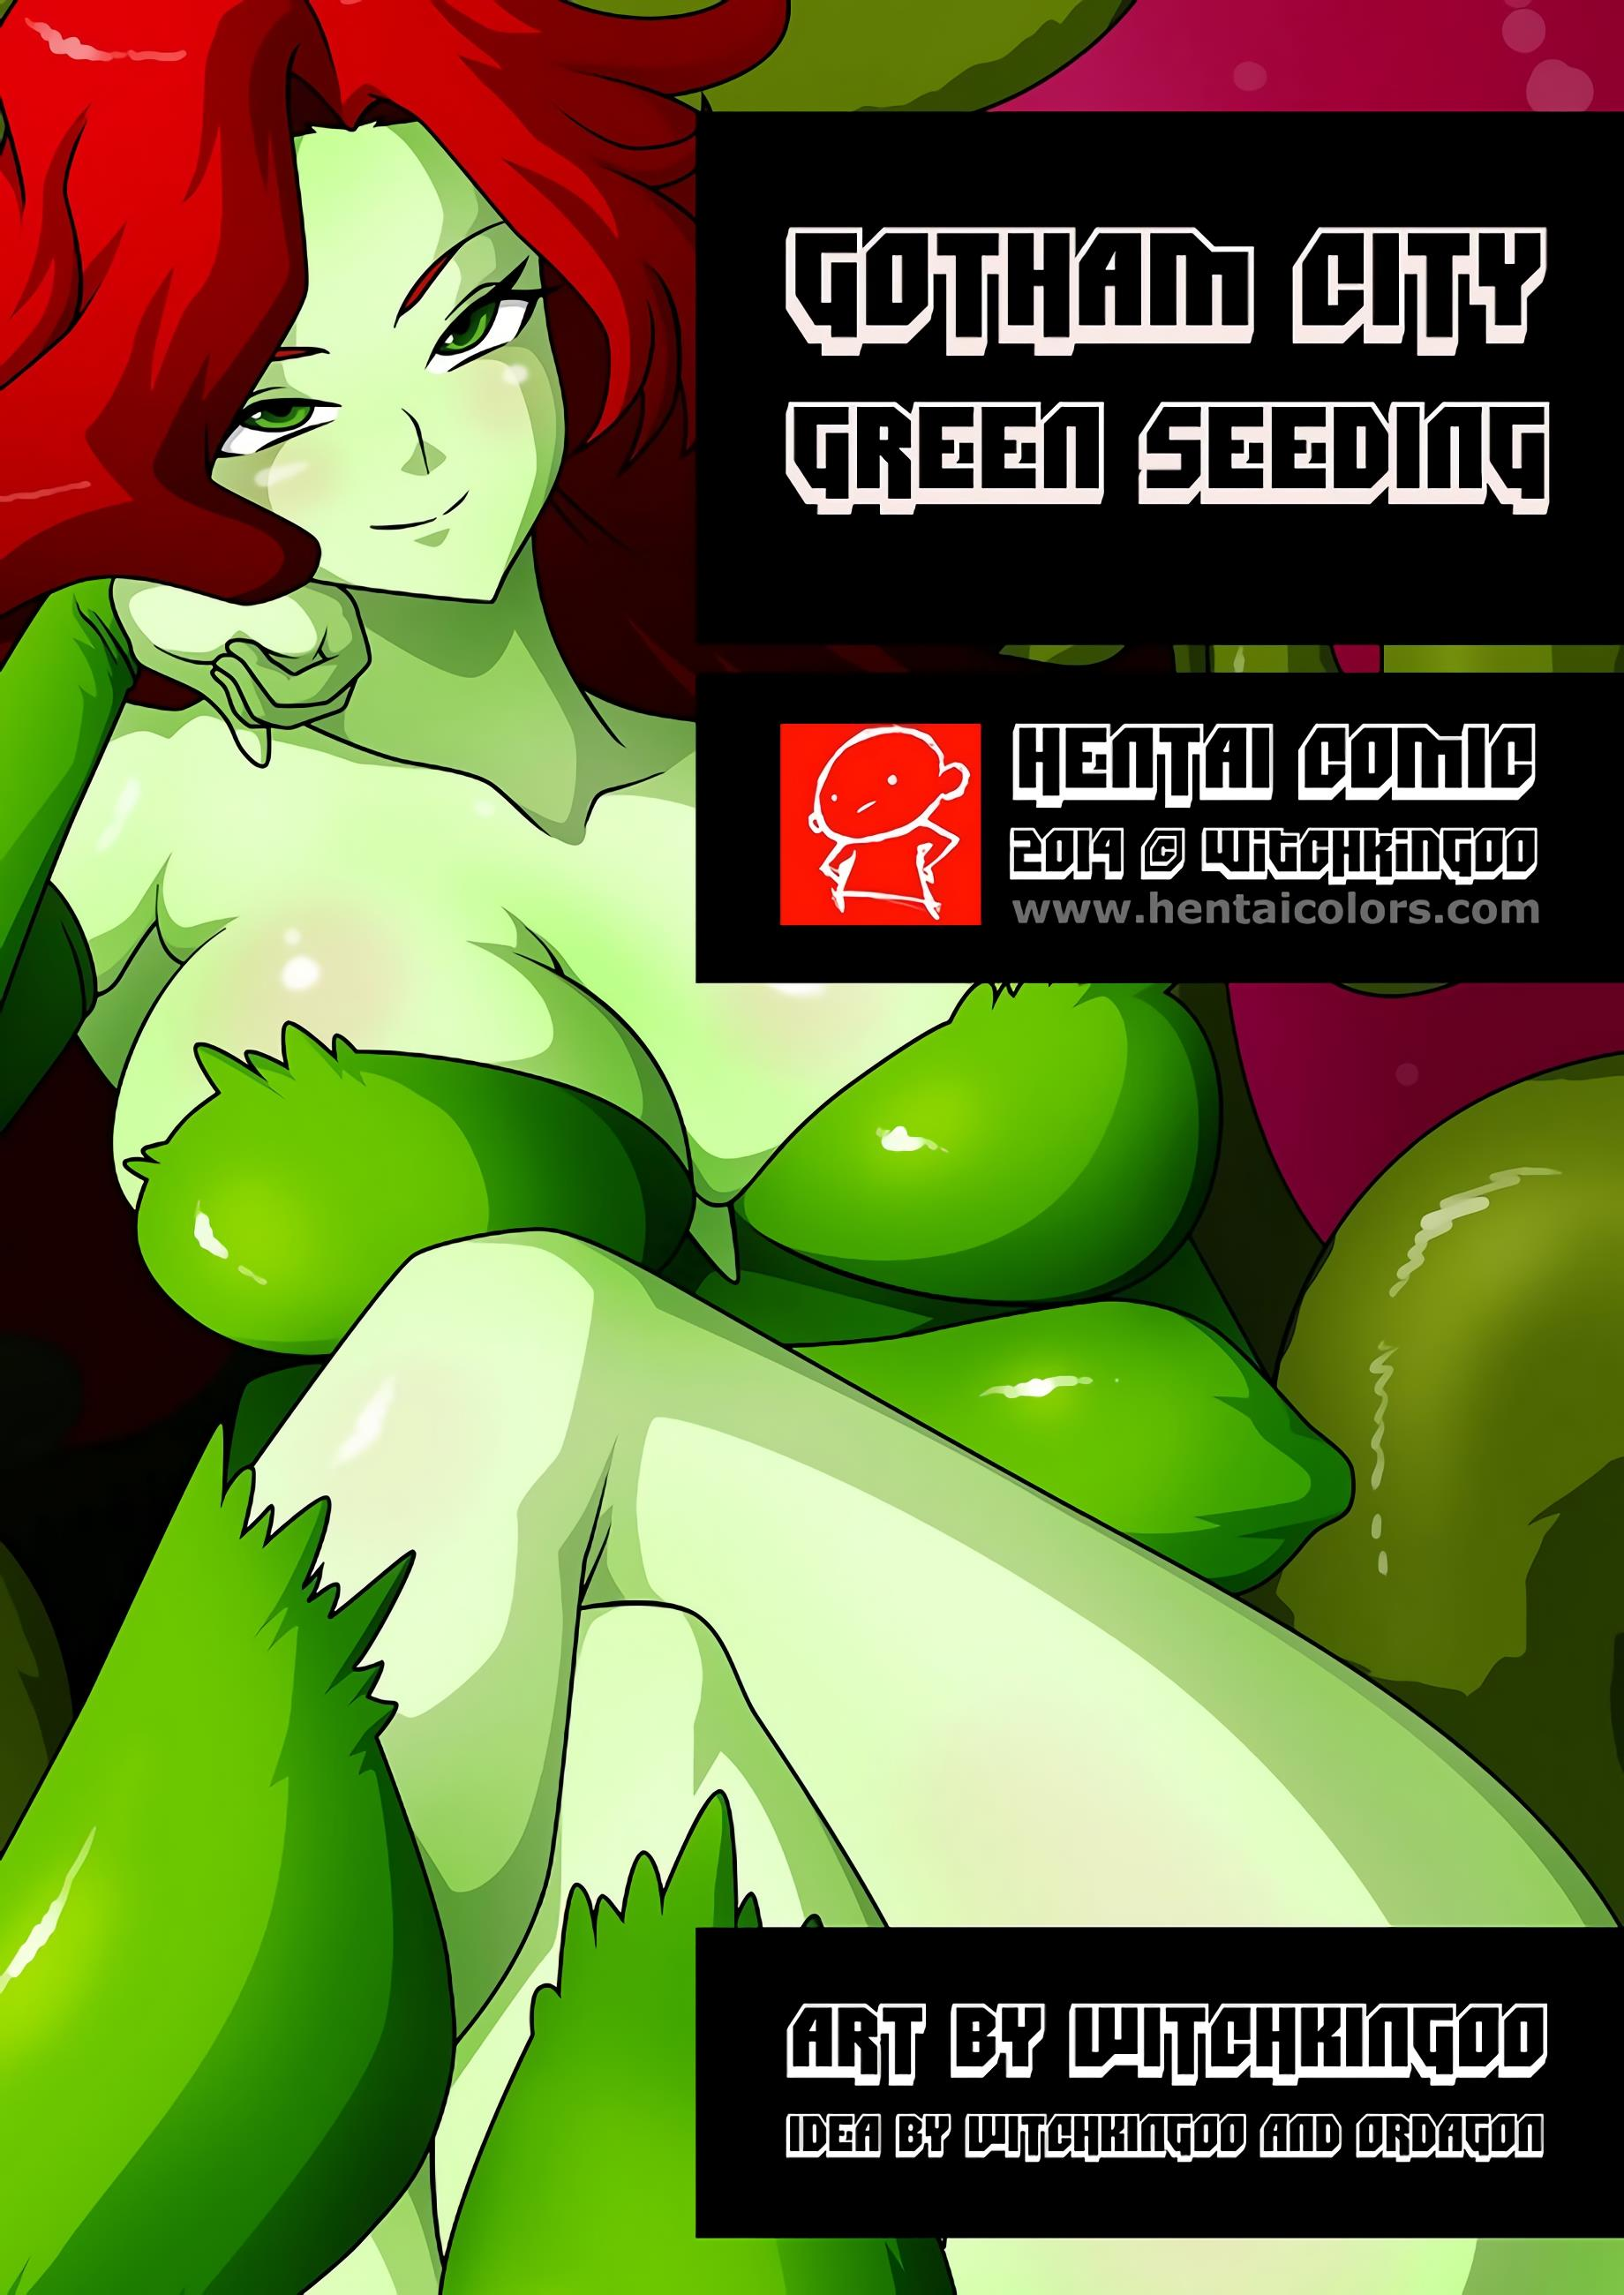 Gotham City Green Seeding